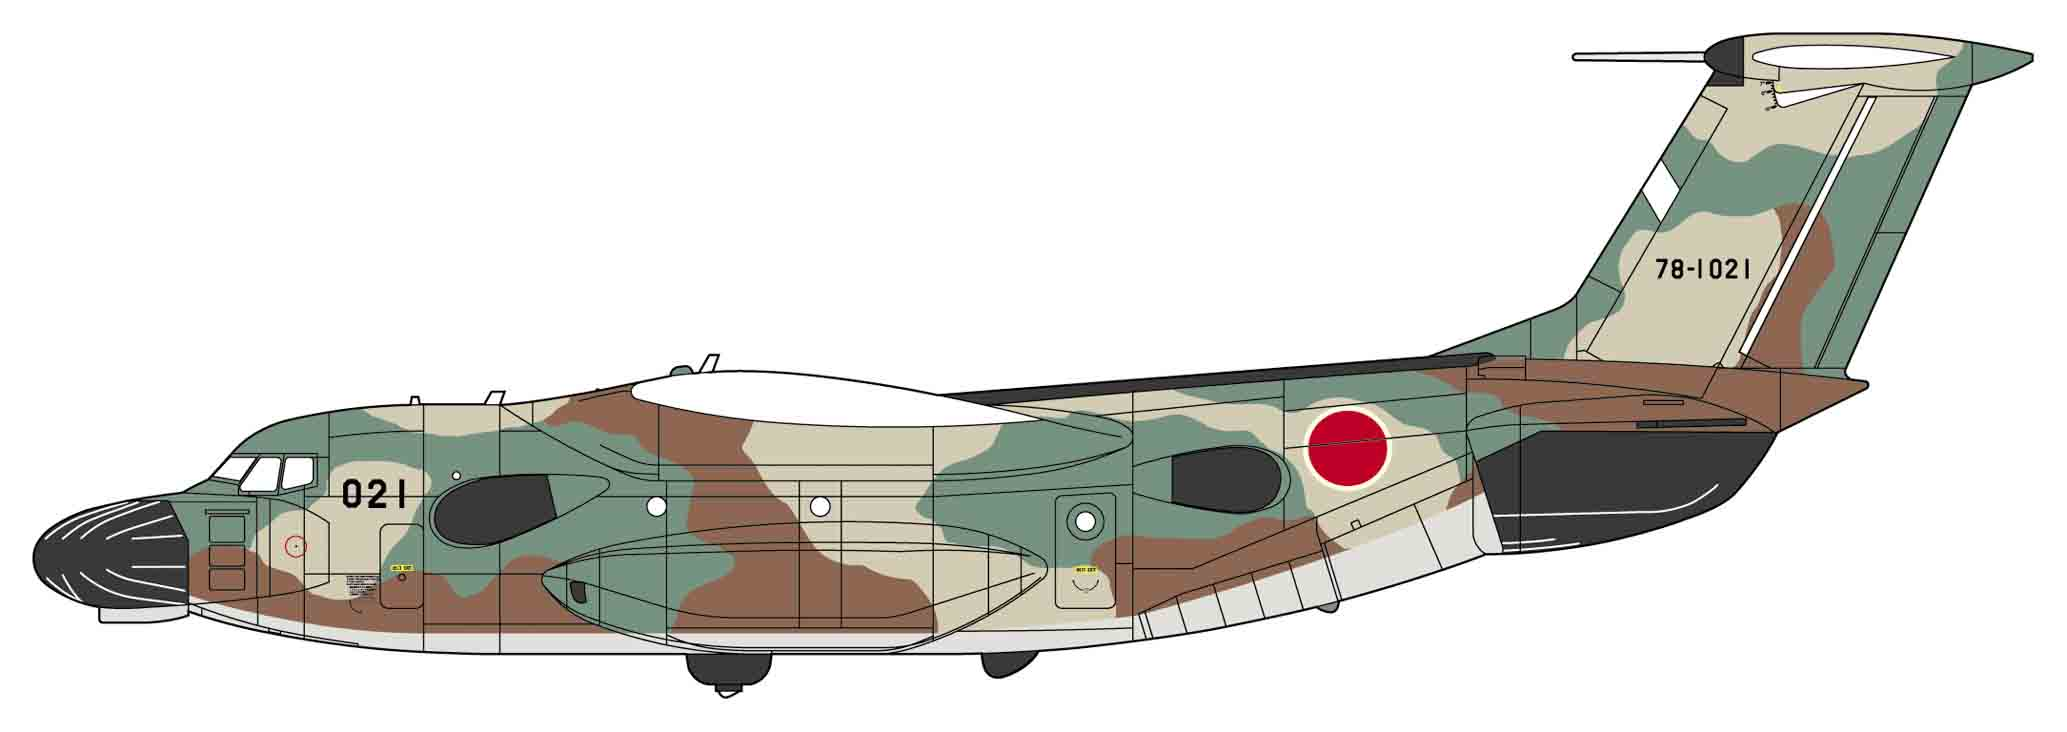 Hasegawa 1/200 Kawasaki EC-1 Electric Warfare